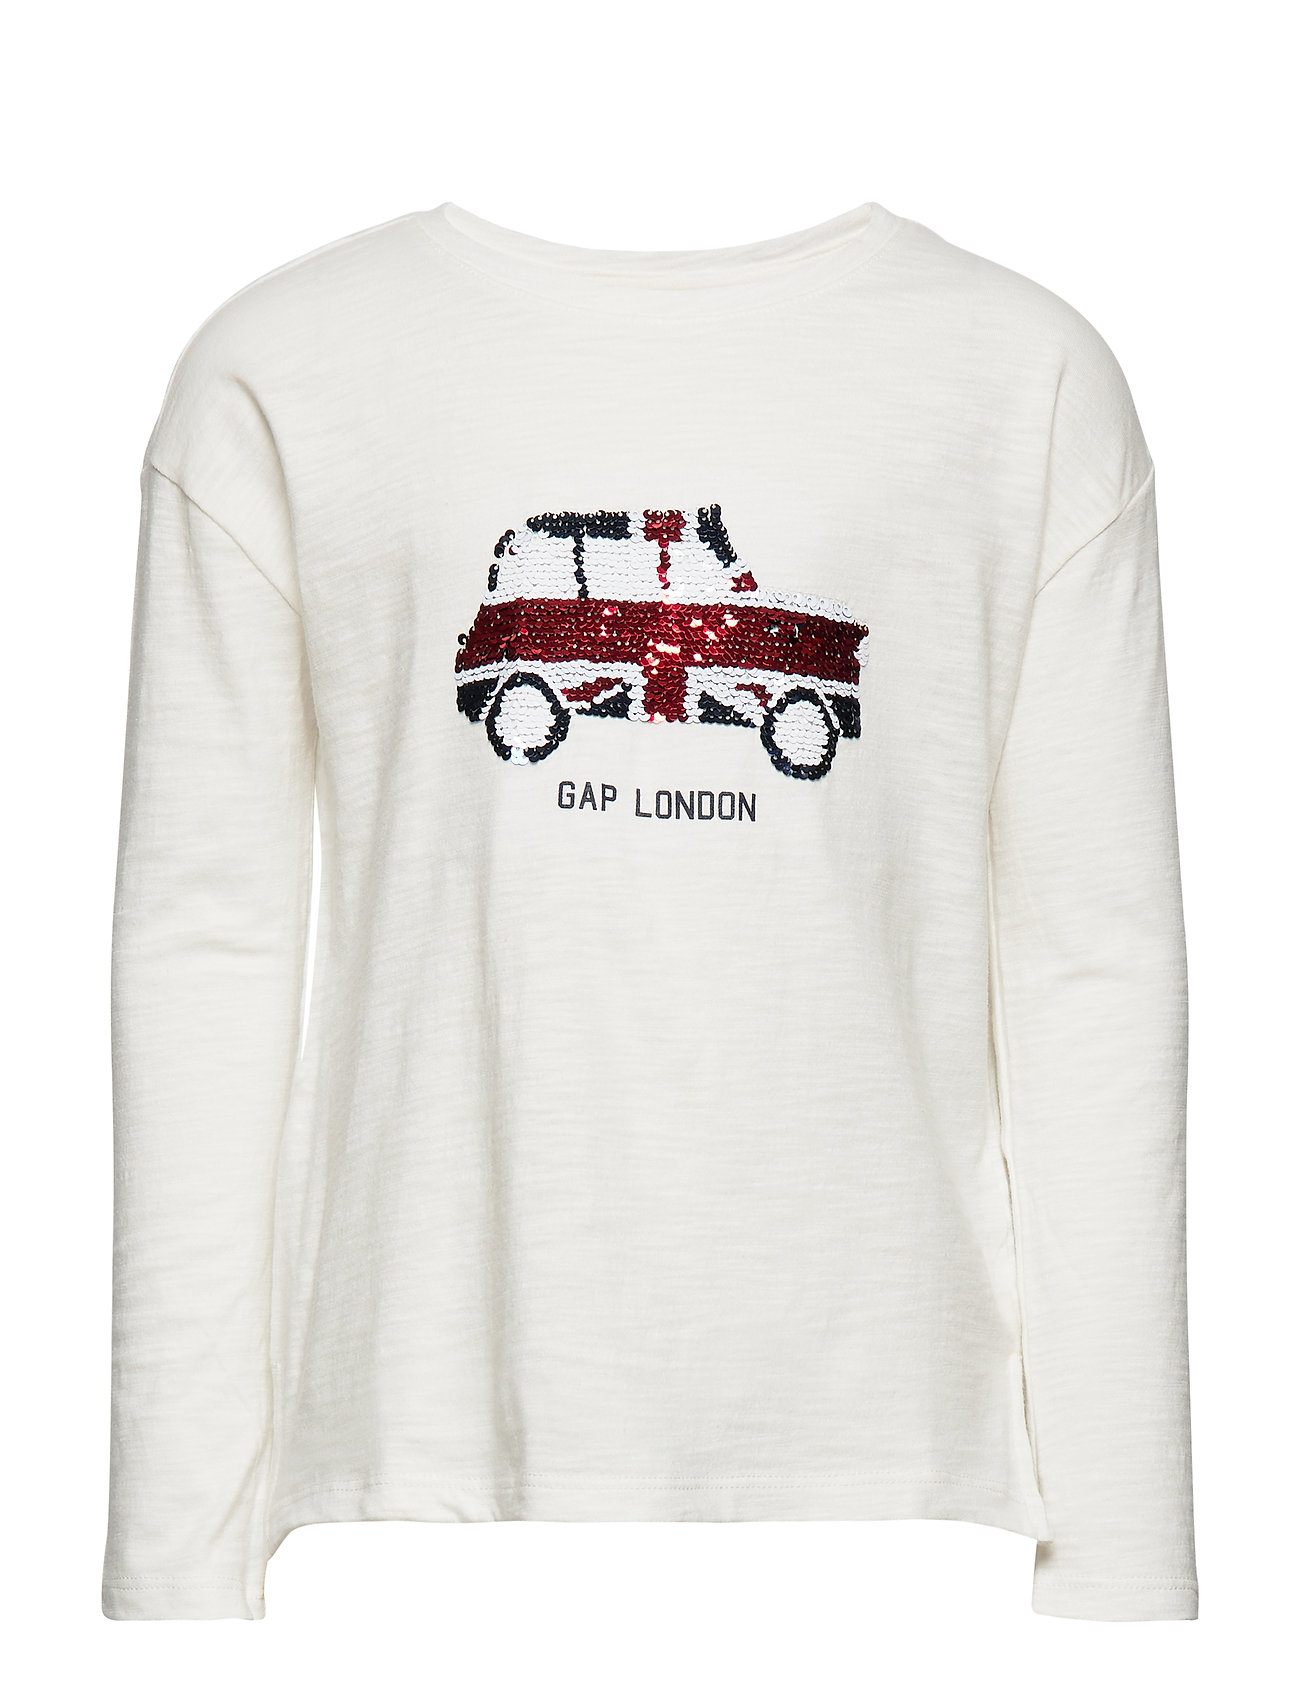 Image of Kids Flippy Sequin Graphic T-Shirt Langærmet T-shirt Hvid GAP (3232787939)